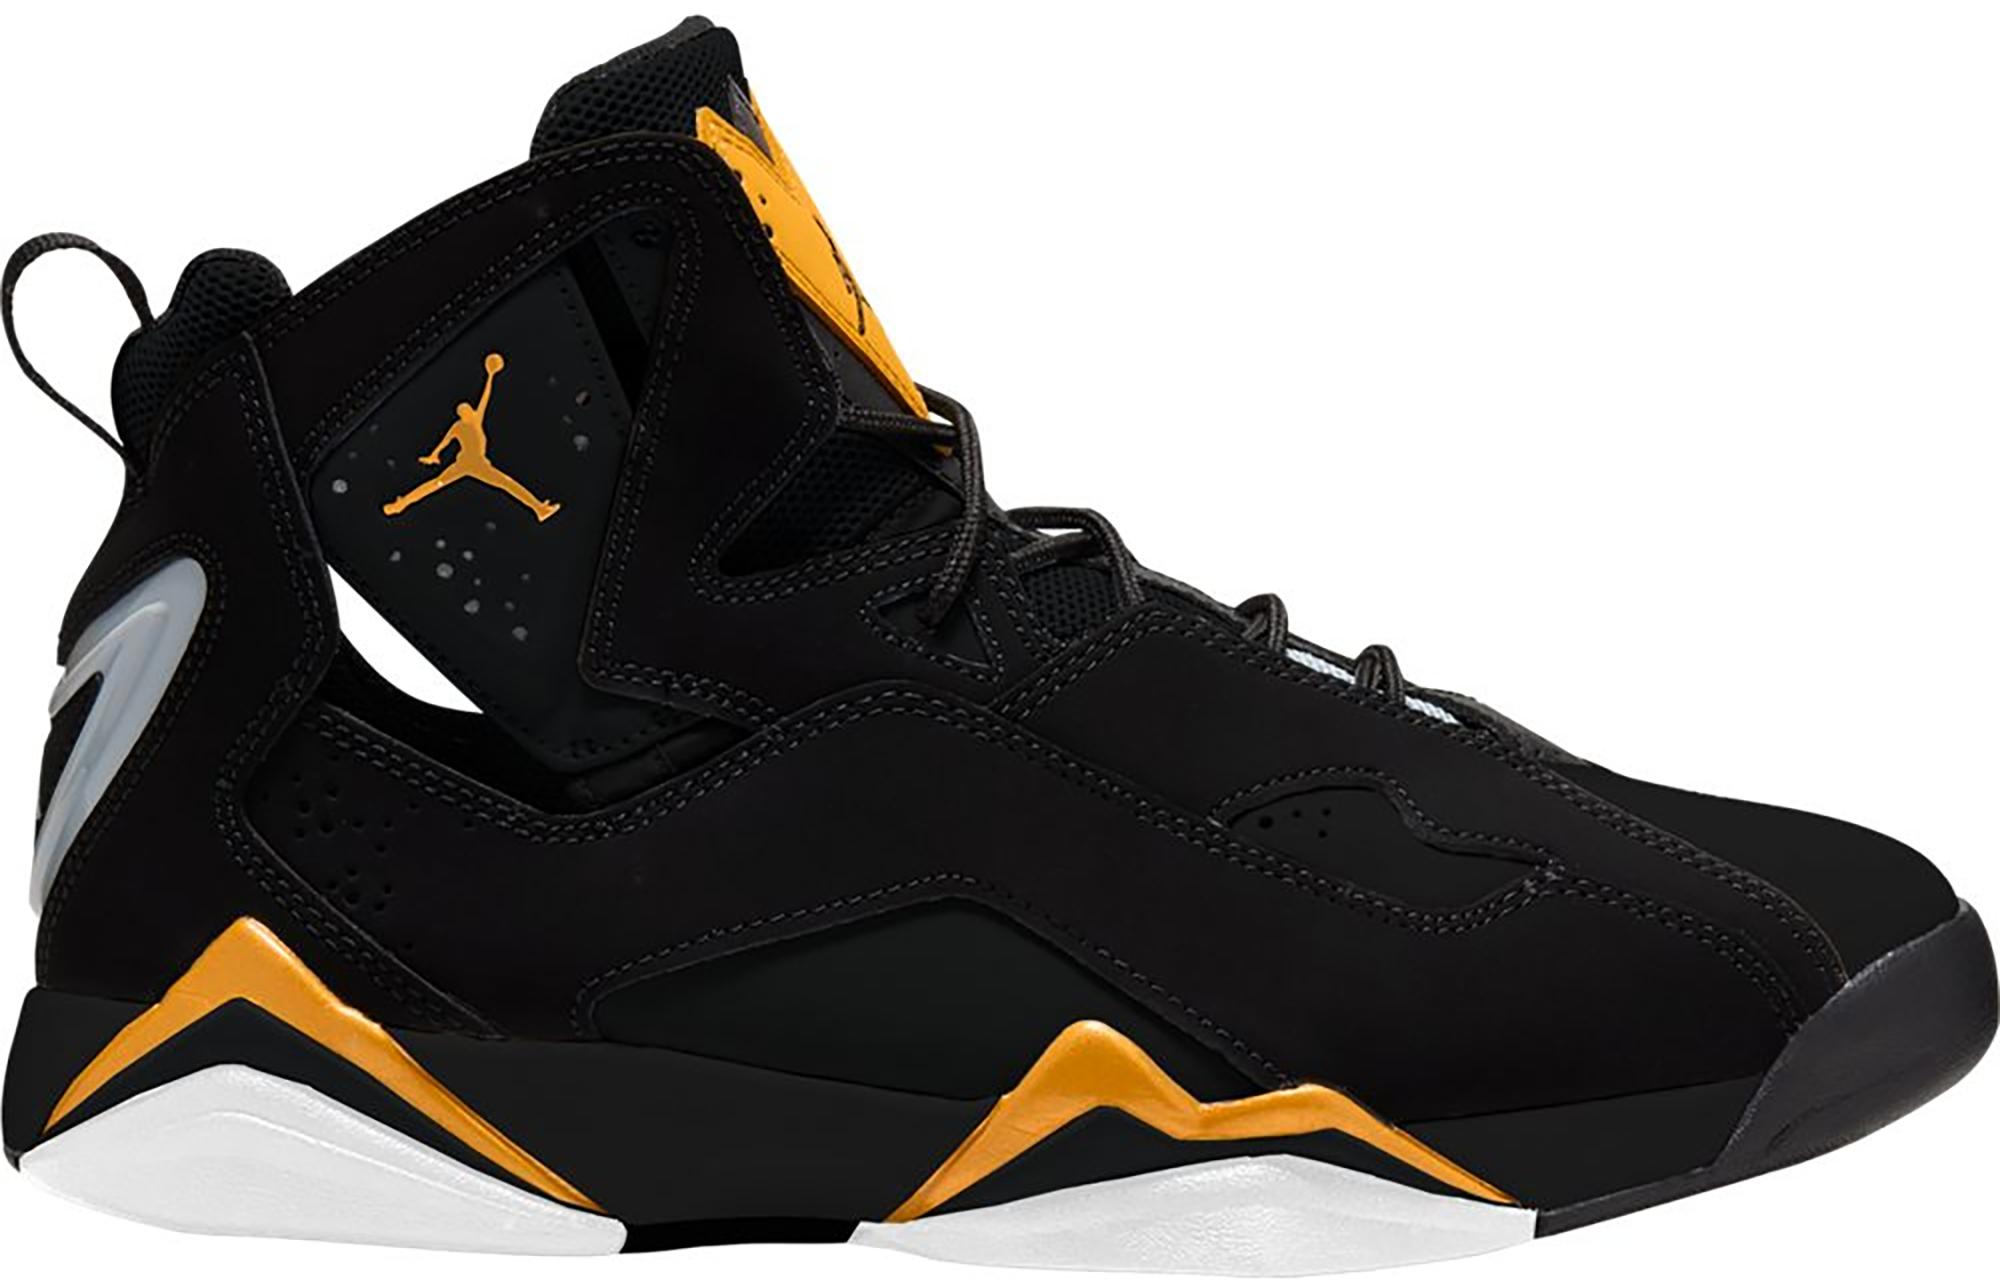 Jordan True Flight Black Metallic Gold